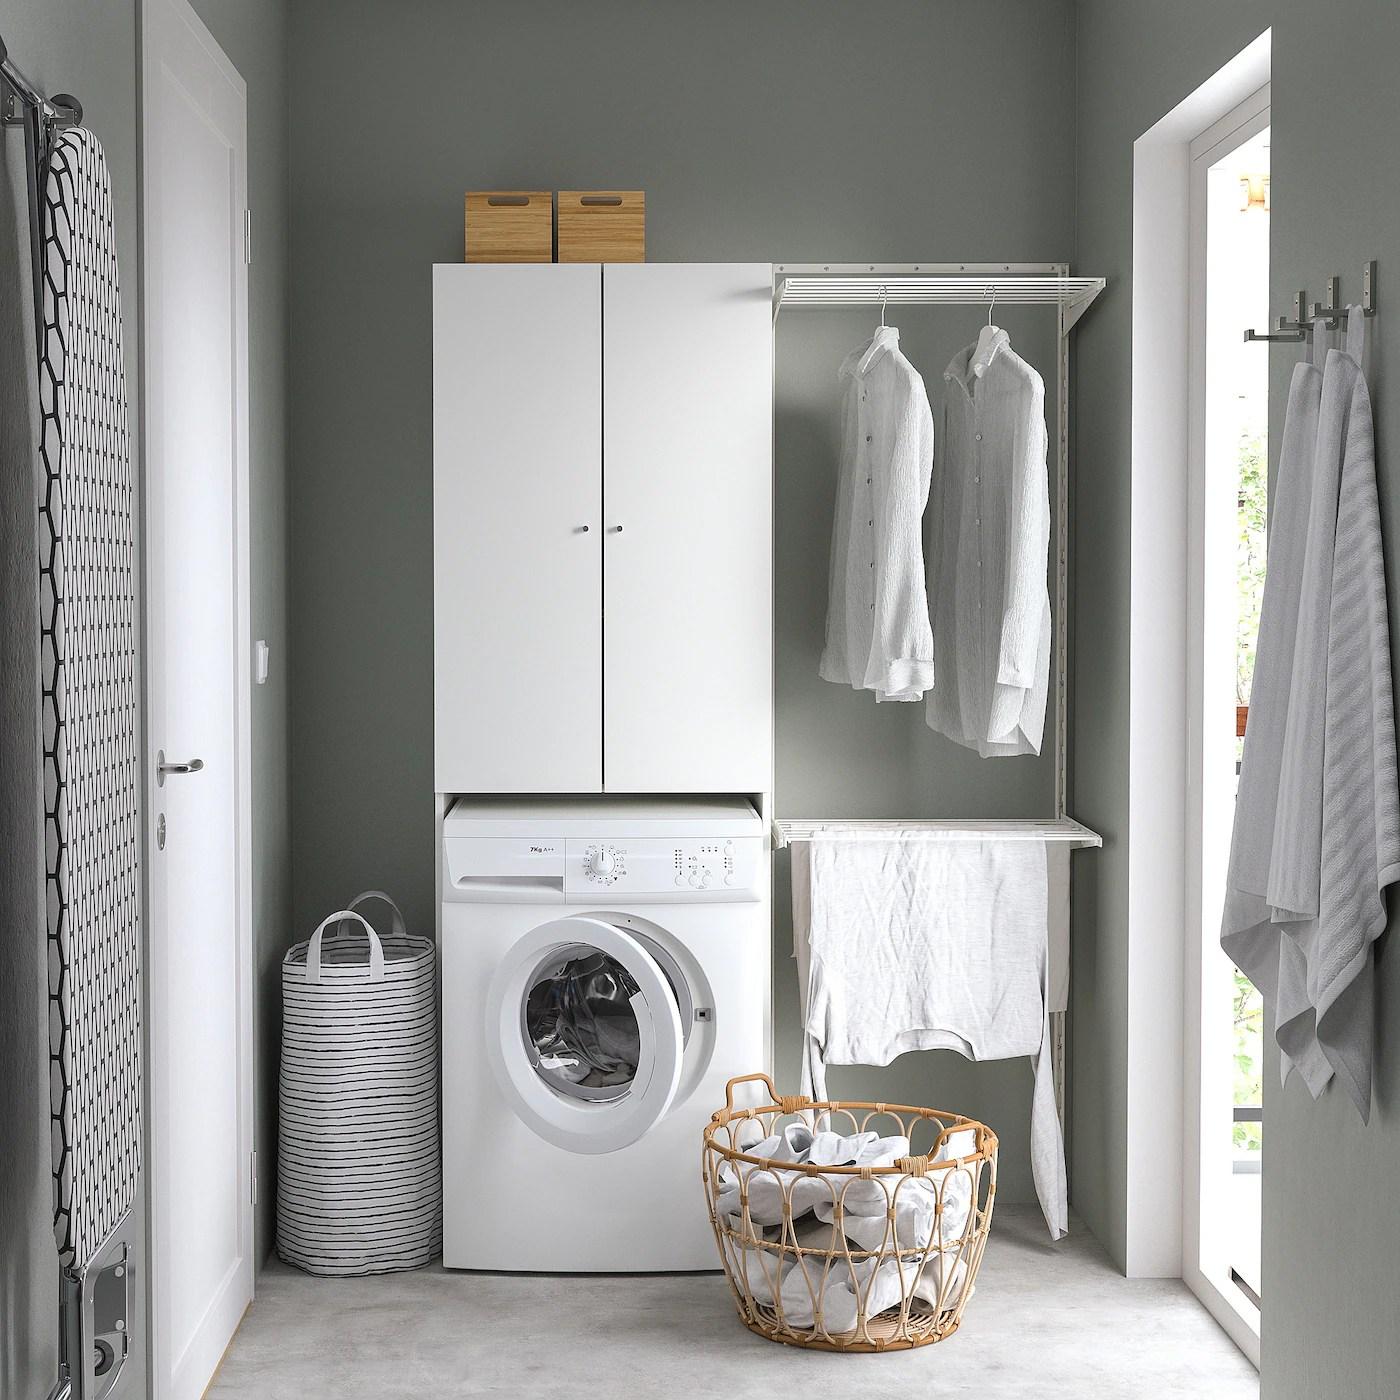 Nysjon Meuble Pour Machine A Laver Blanc 65x190 Cm Ikea